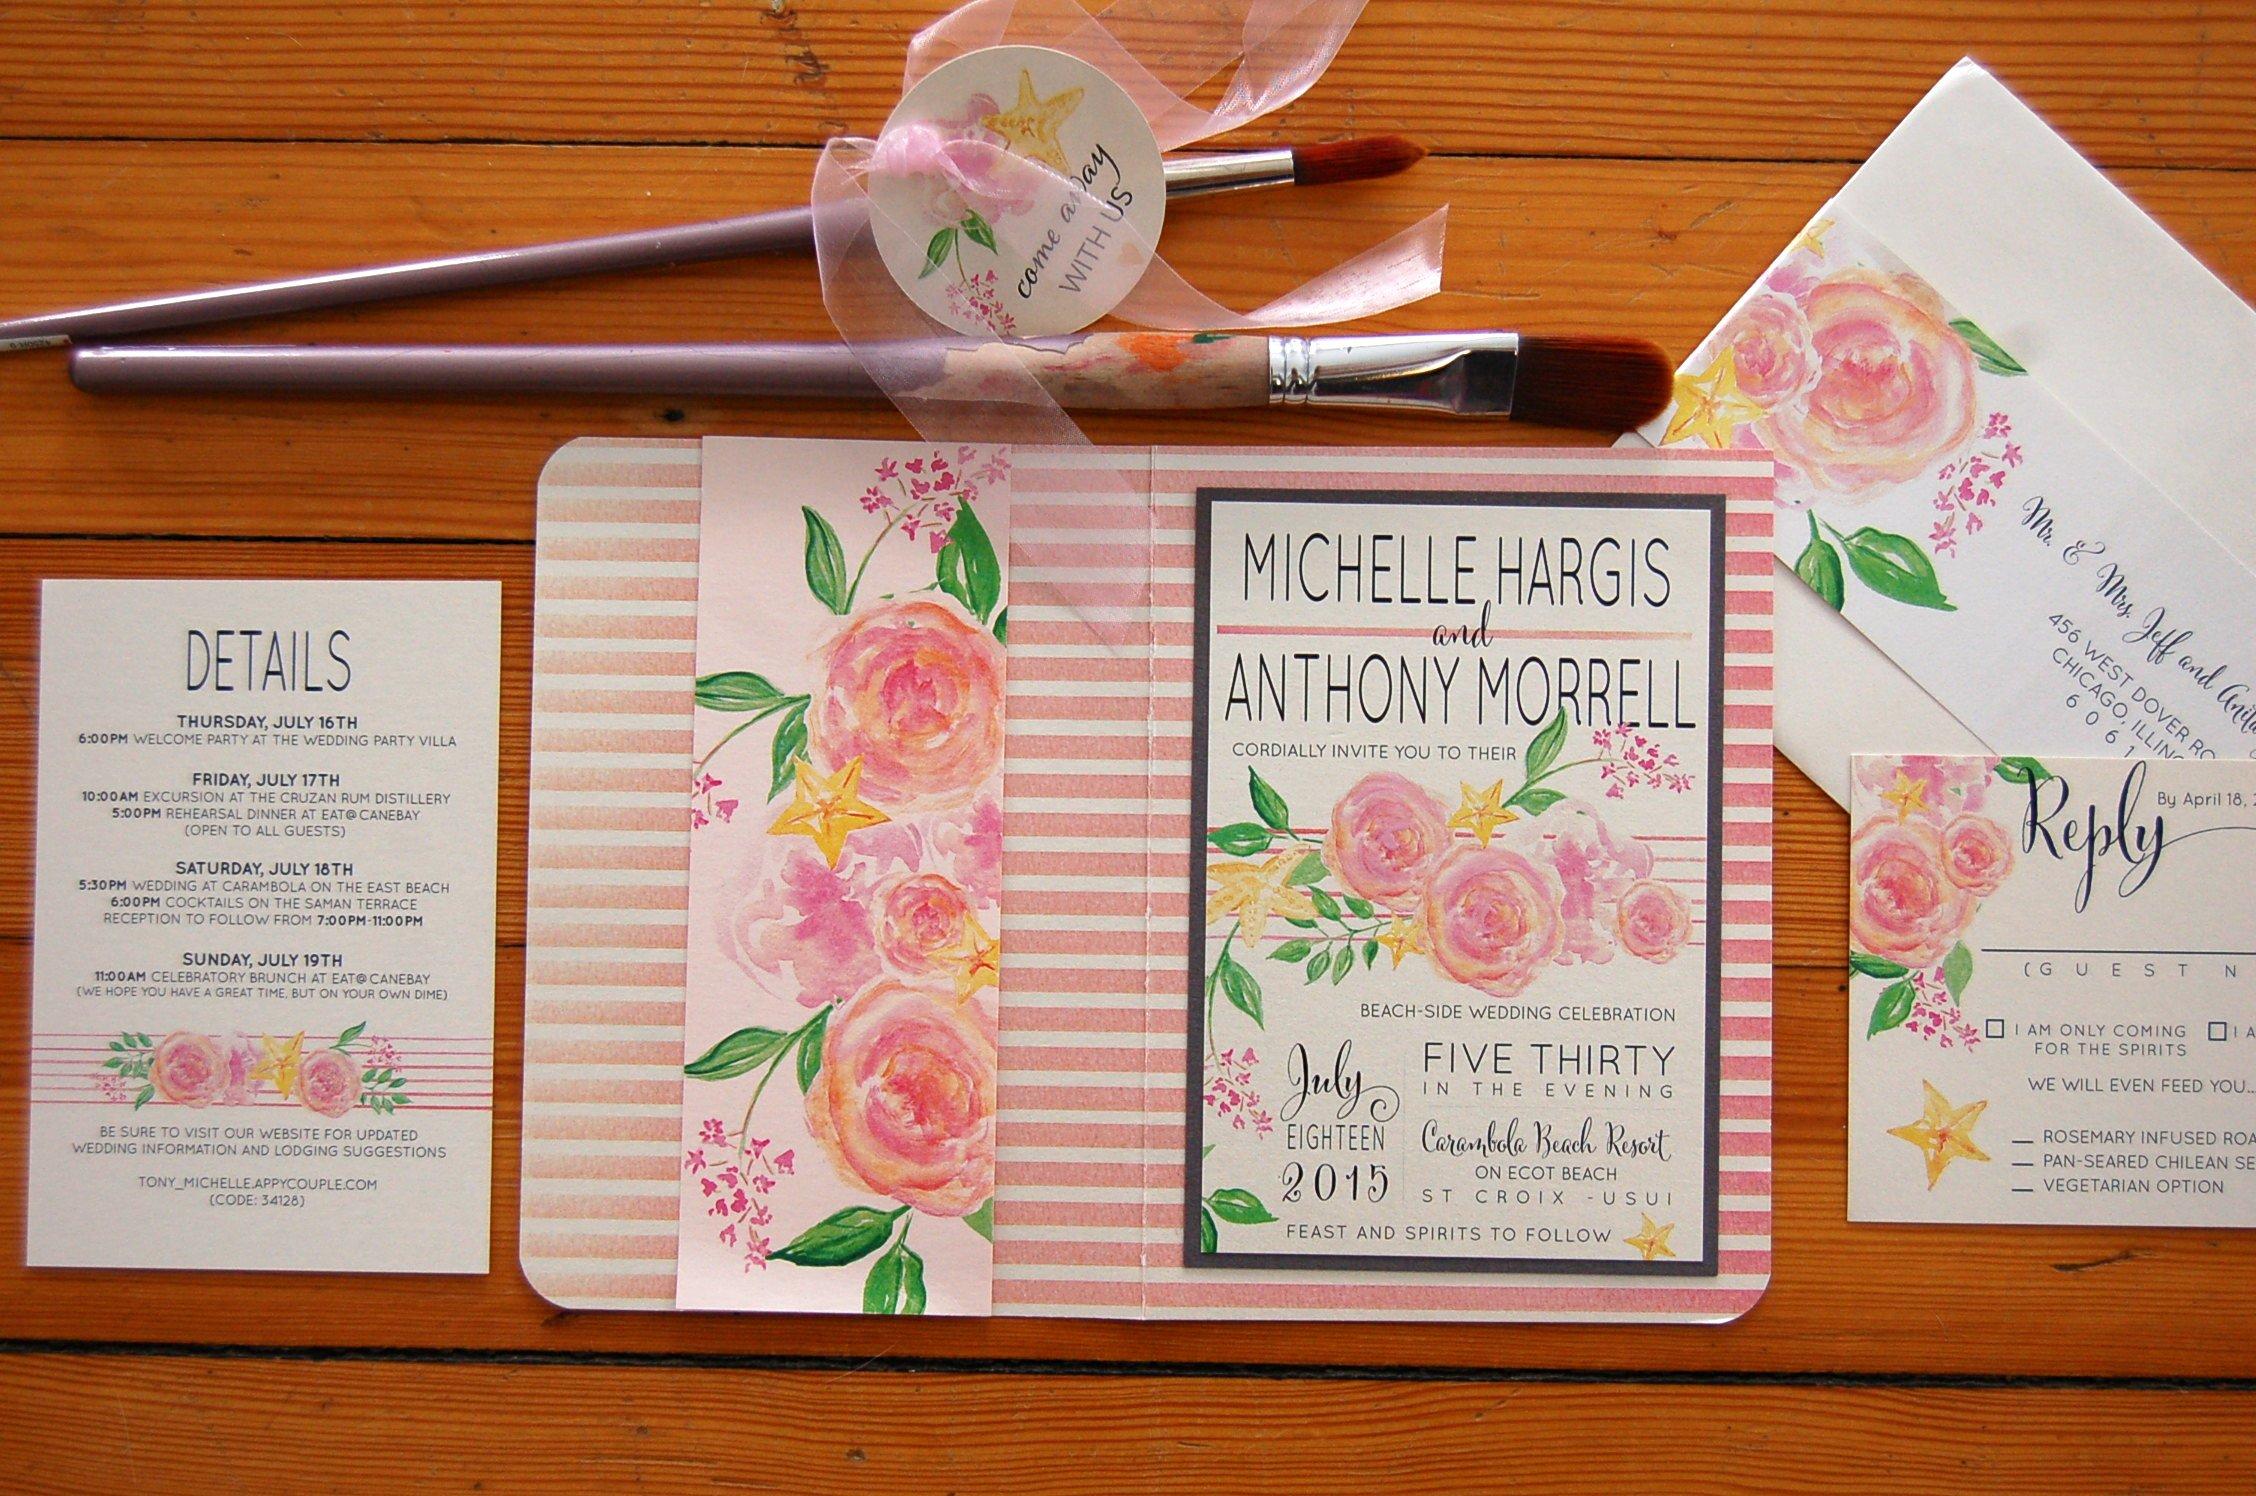 Hand Addressed Wedding Invitations Cost